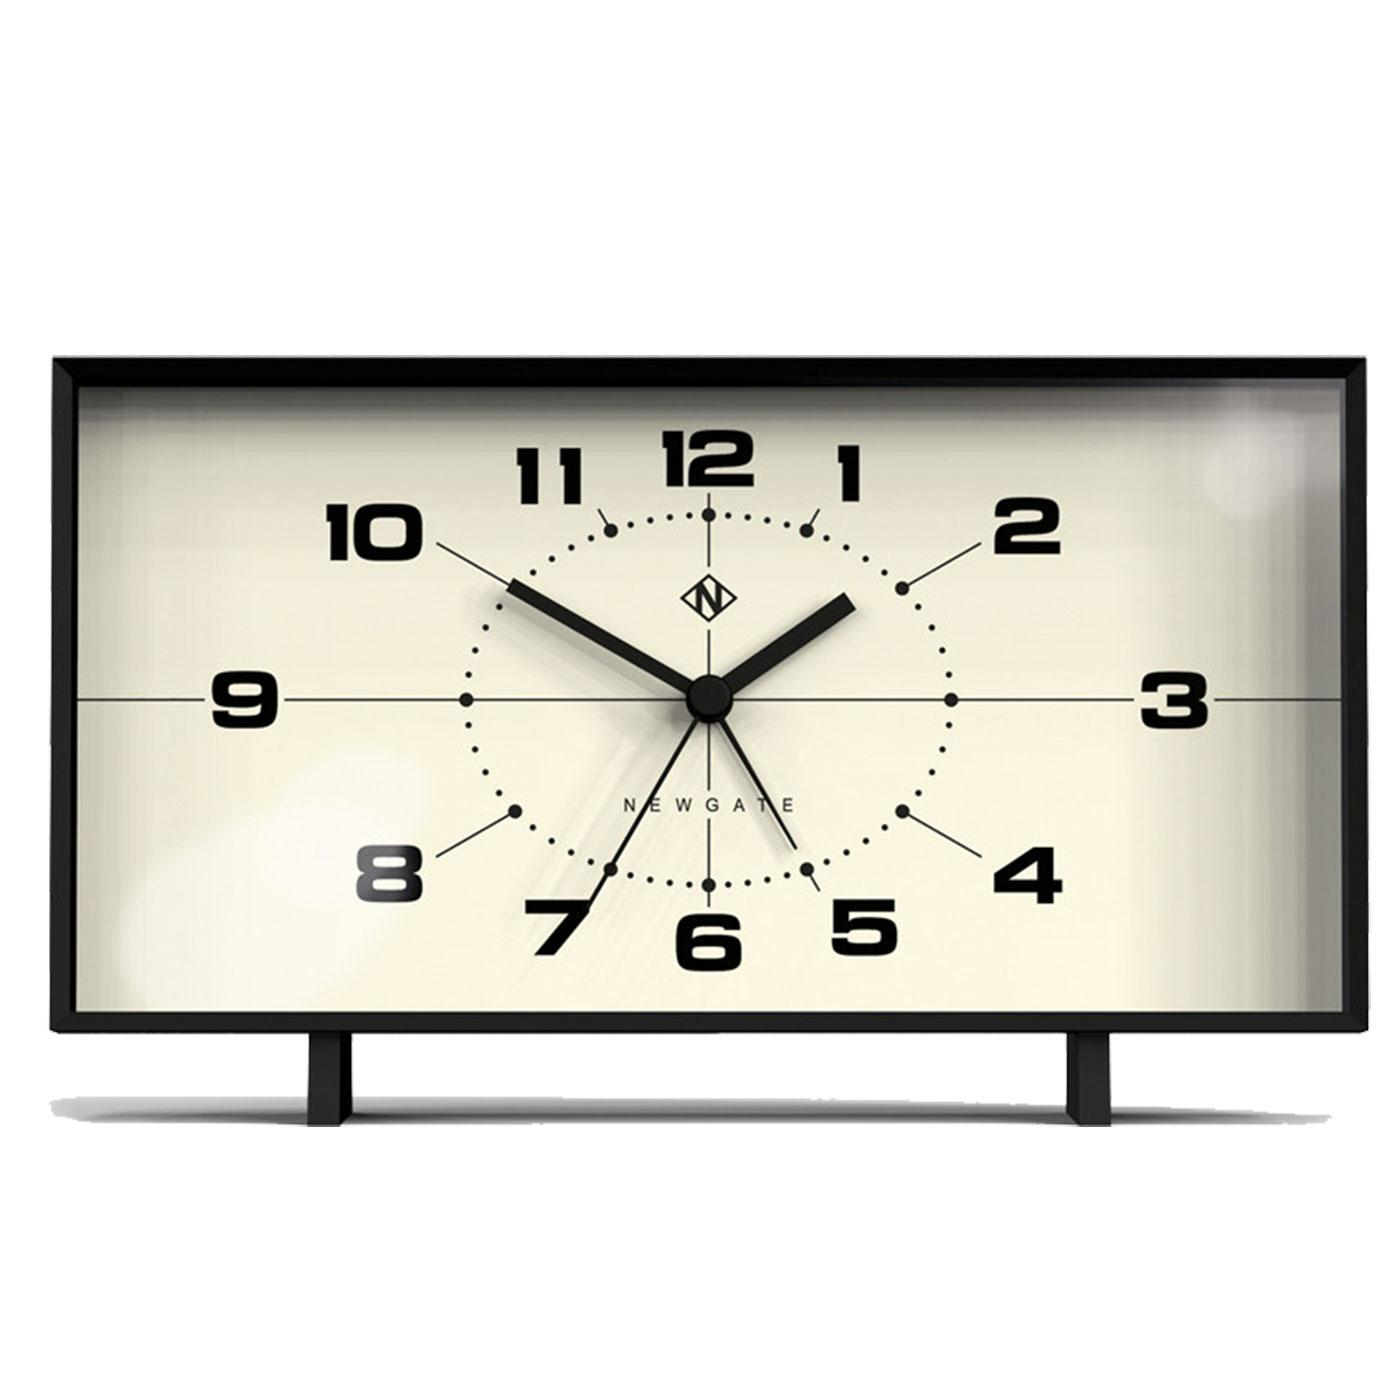 Wideboy NEWGATE CLOCKS Retro 50s Alarm Clock BW